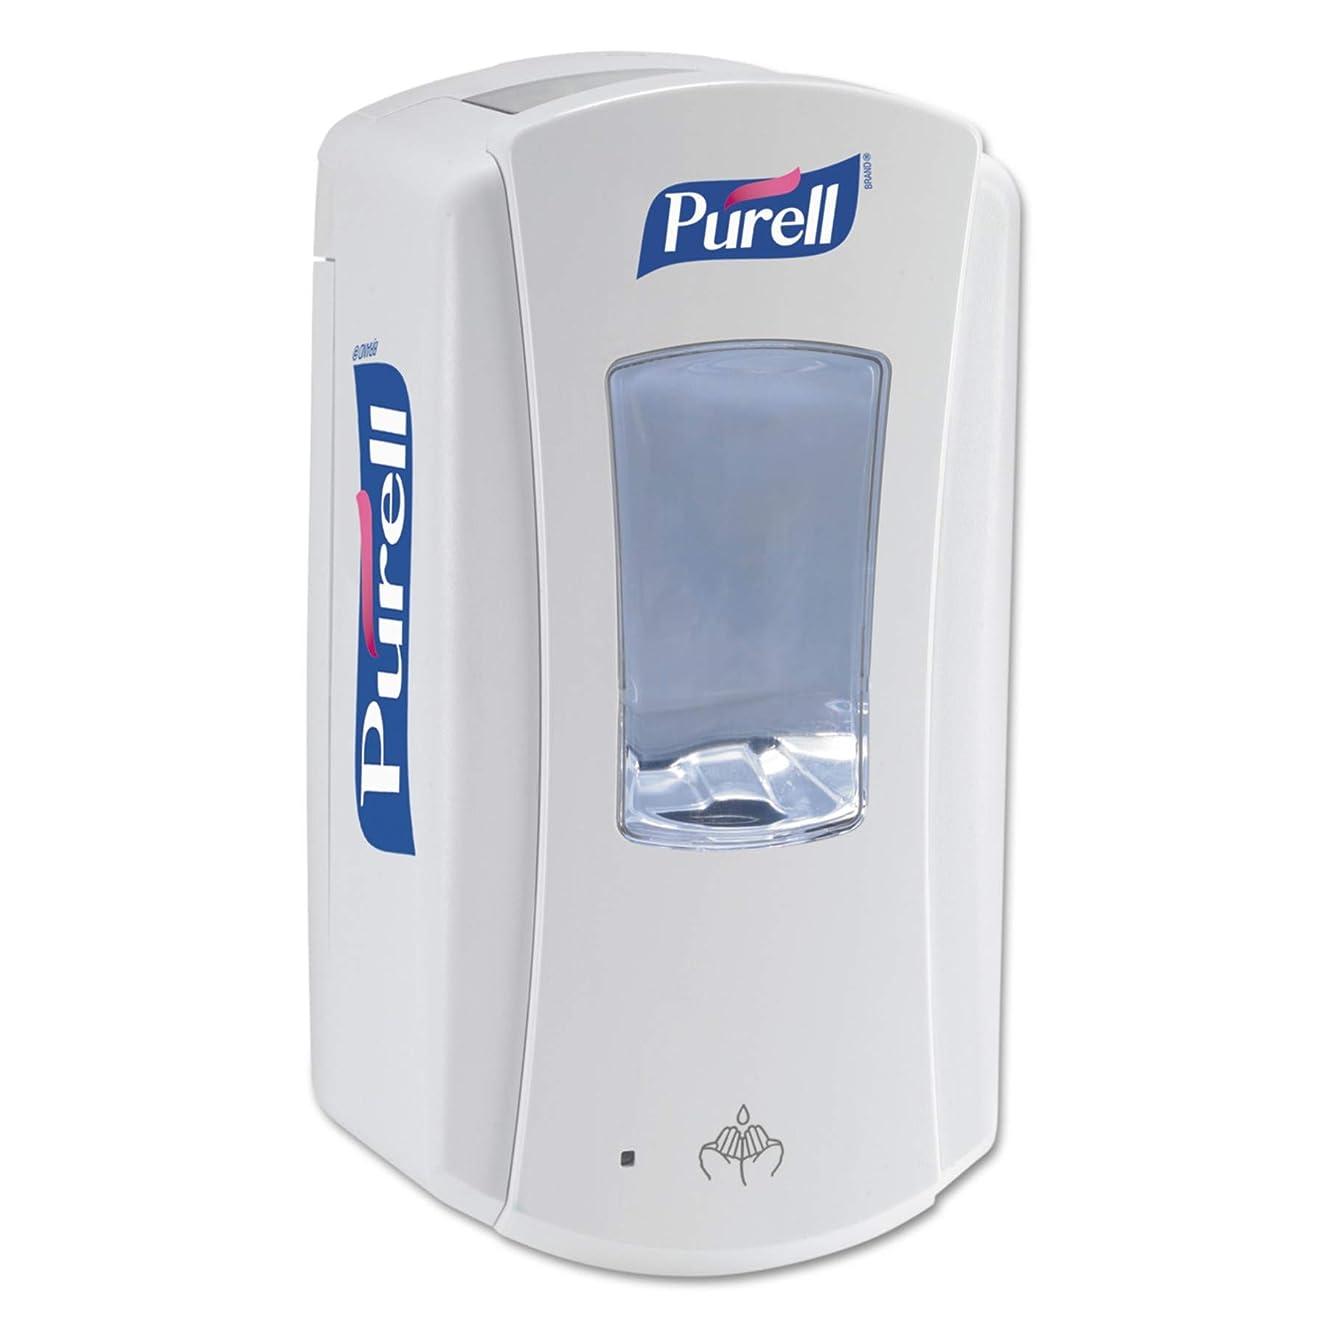 PURELL LTX-12 Touch-Free Hand Sanitizer Dispenser, White, Dispenser for PURELL LTX-12 1200 mL Hand Sanitizer Refills - 1920-01